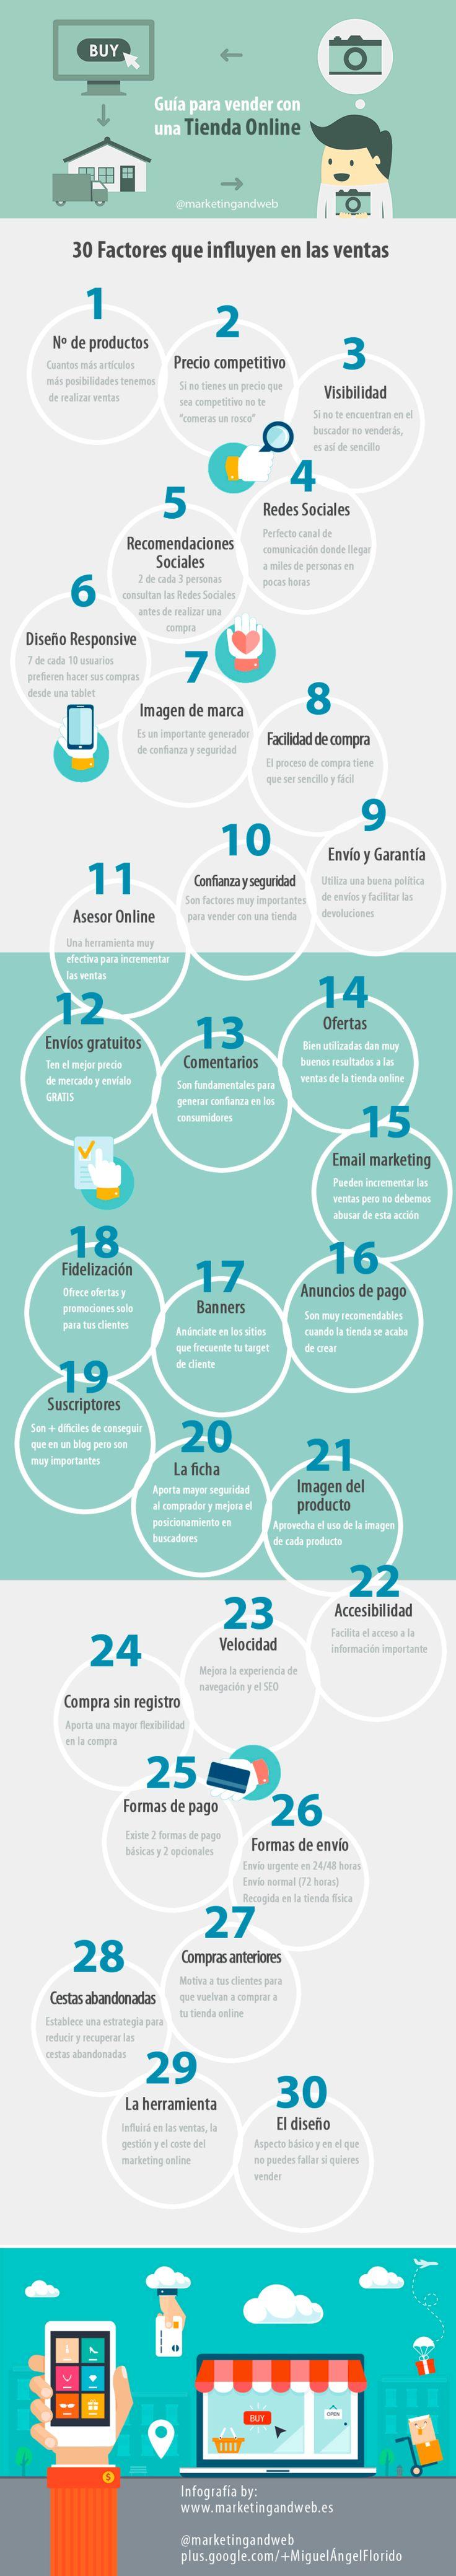 30 factores que influyen en las ventas de tu tienda online #infografia #infographic #ecommerce